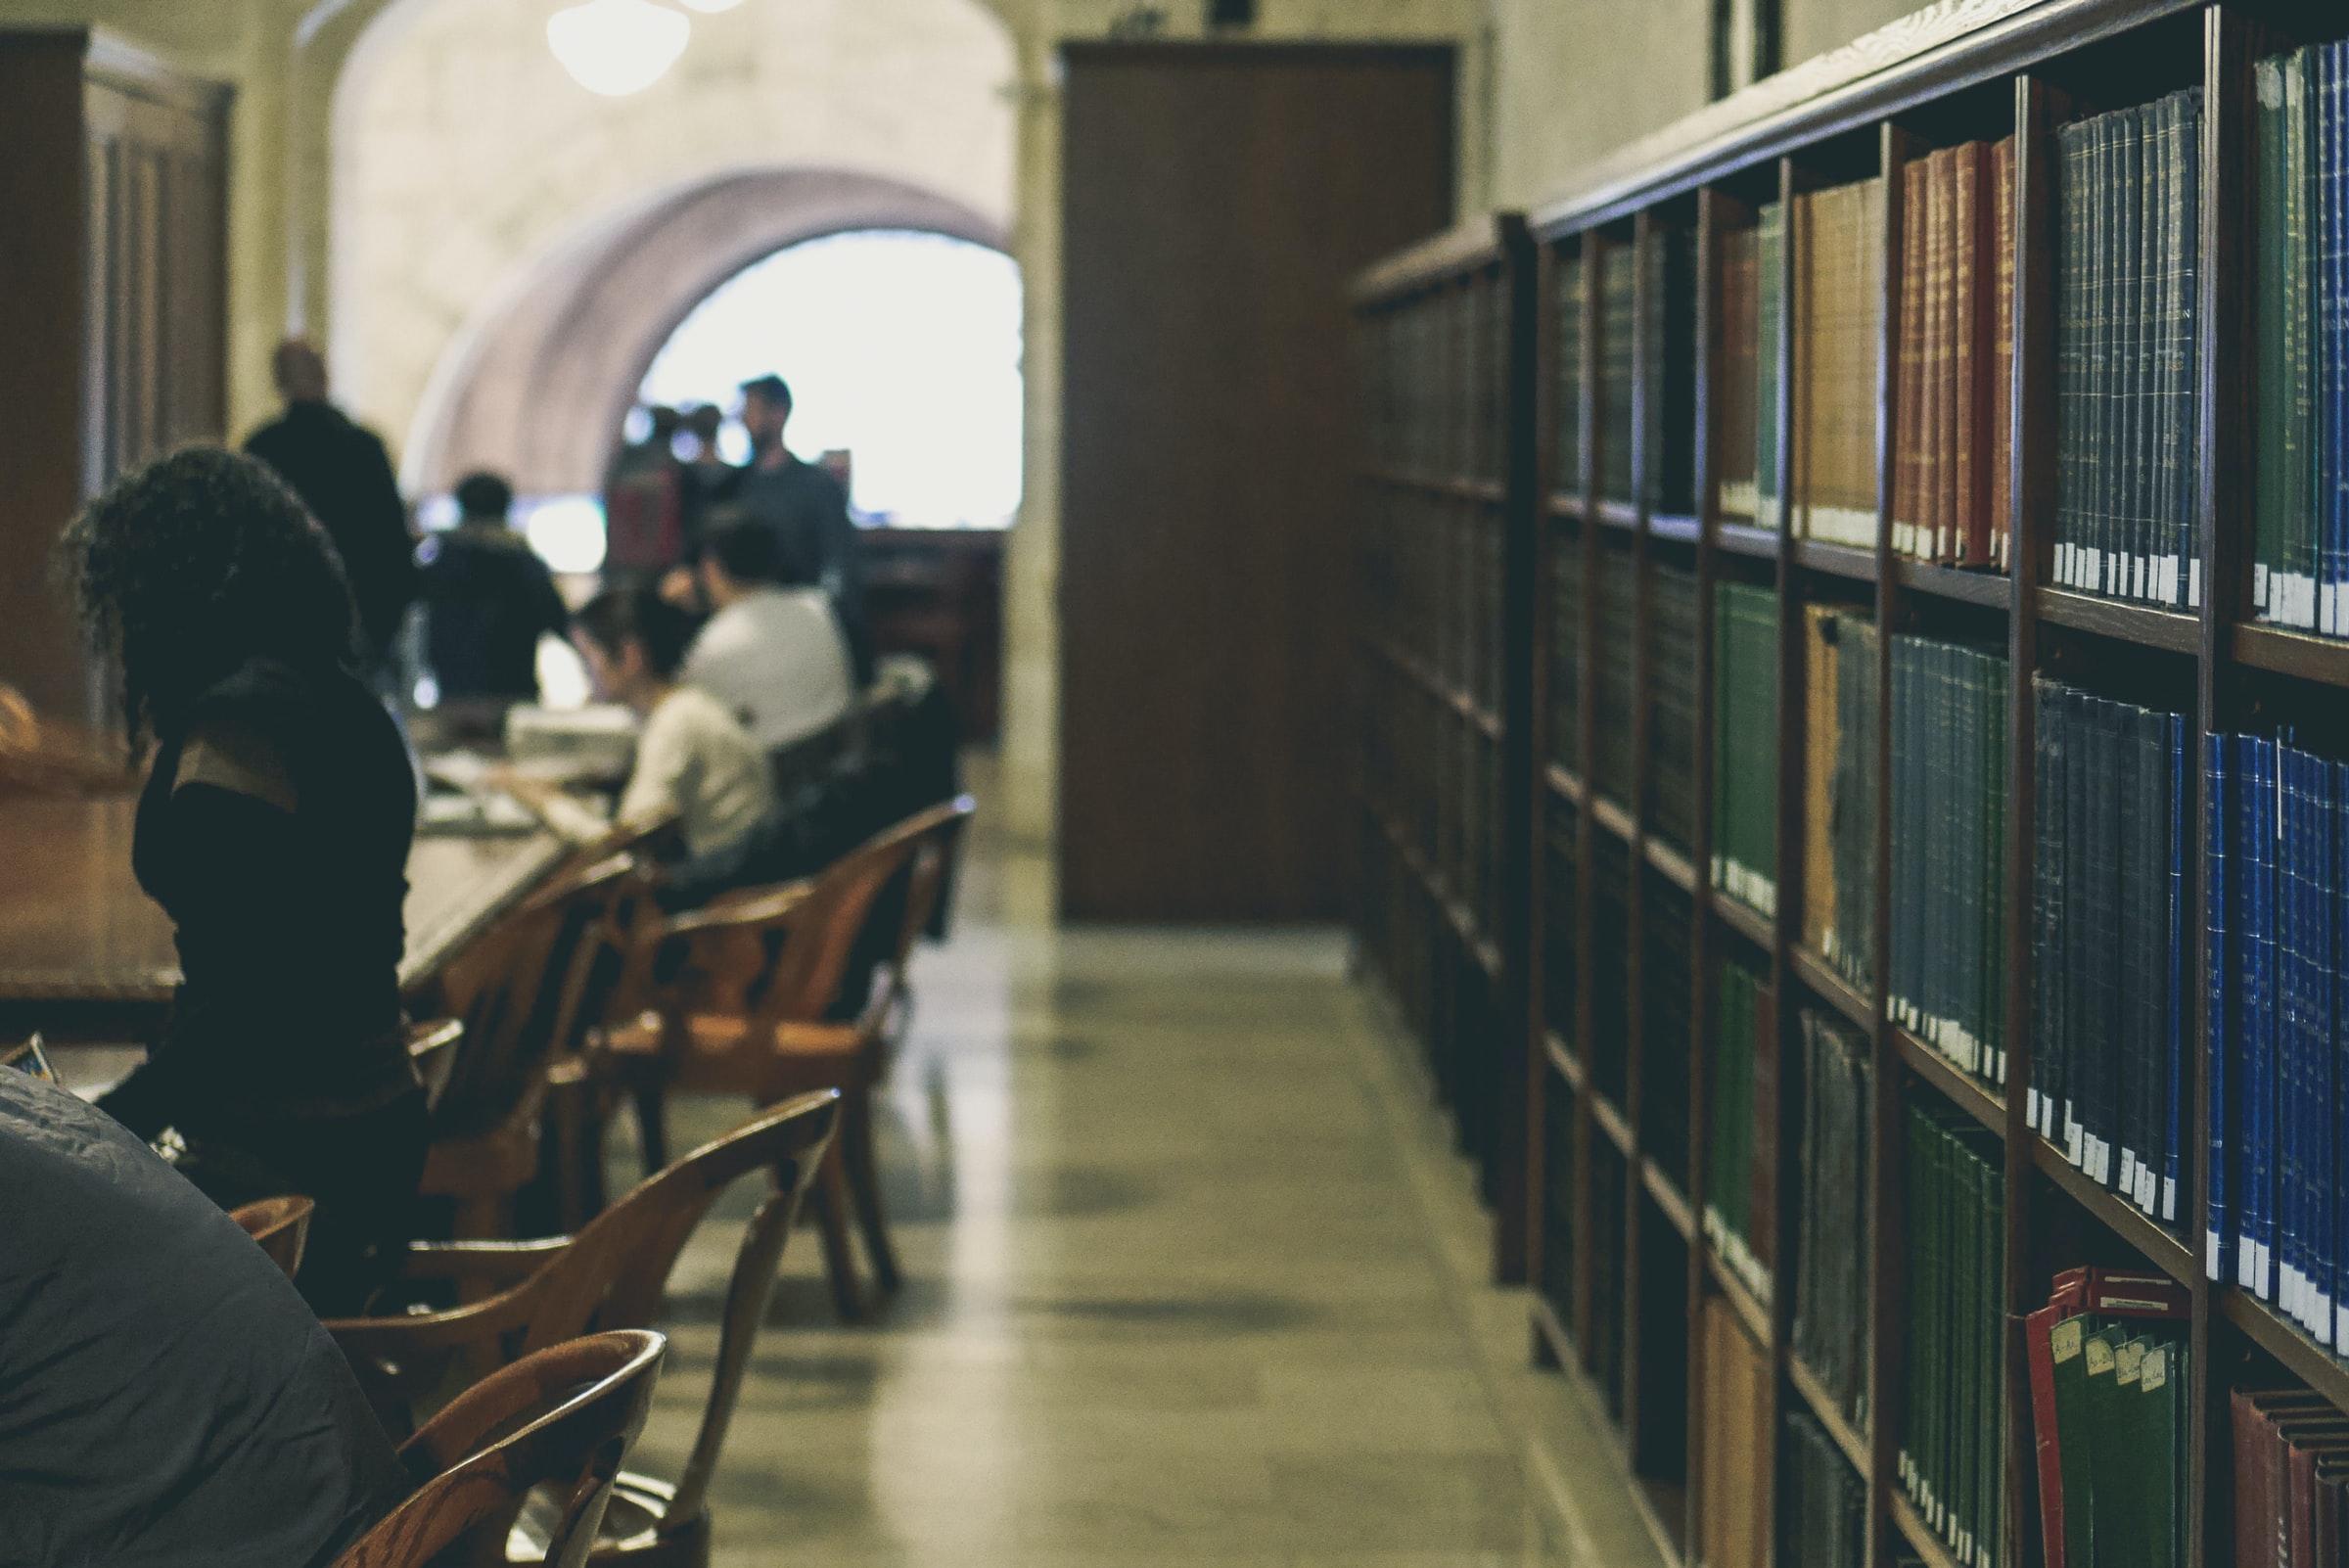 biblioteca giroscopio